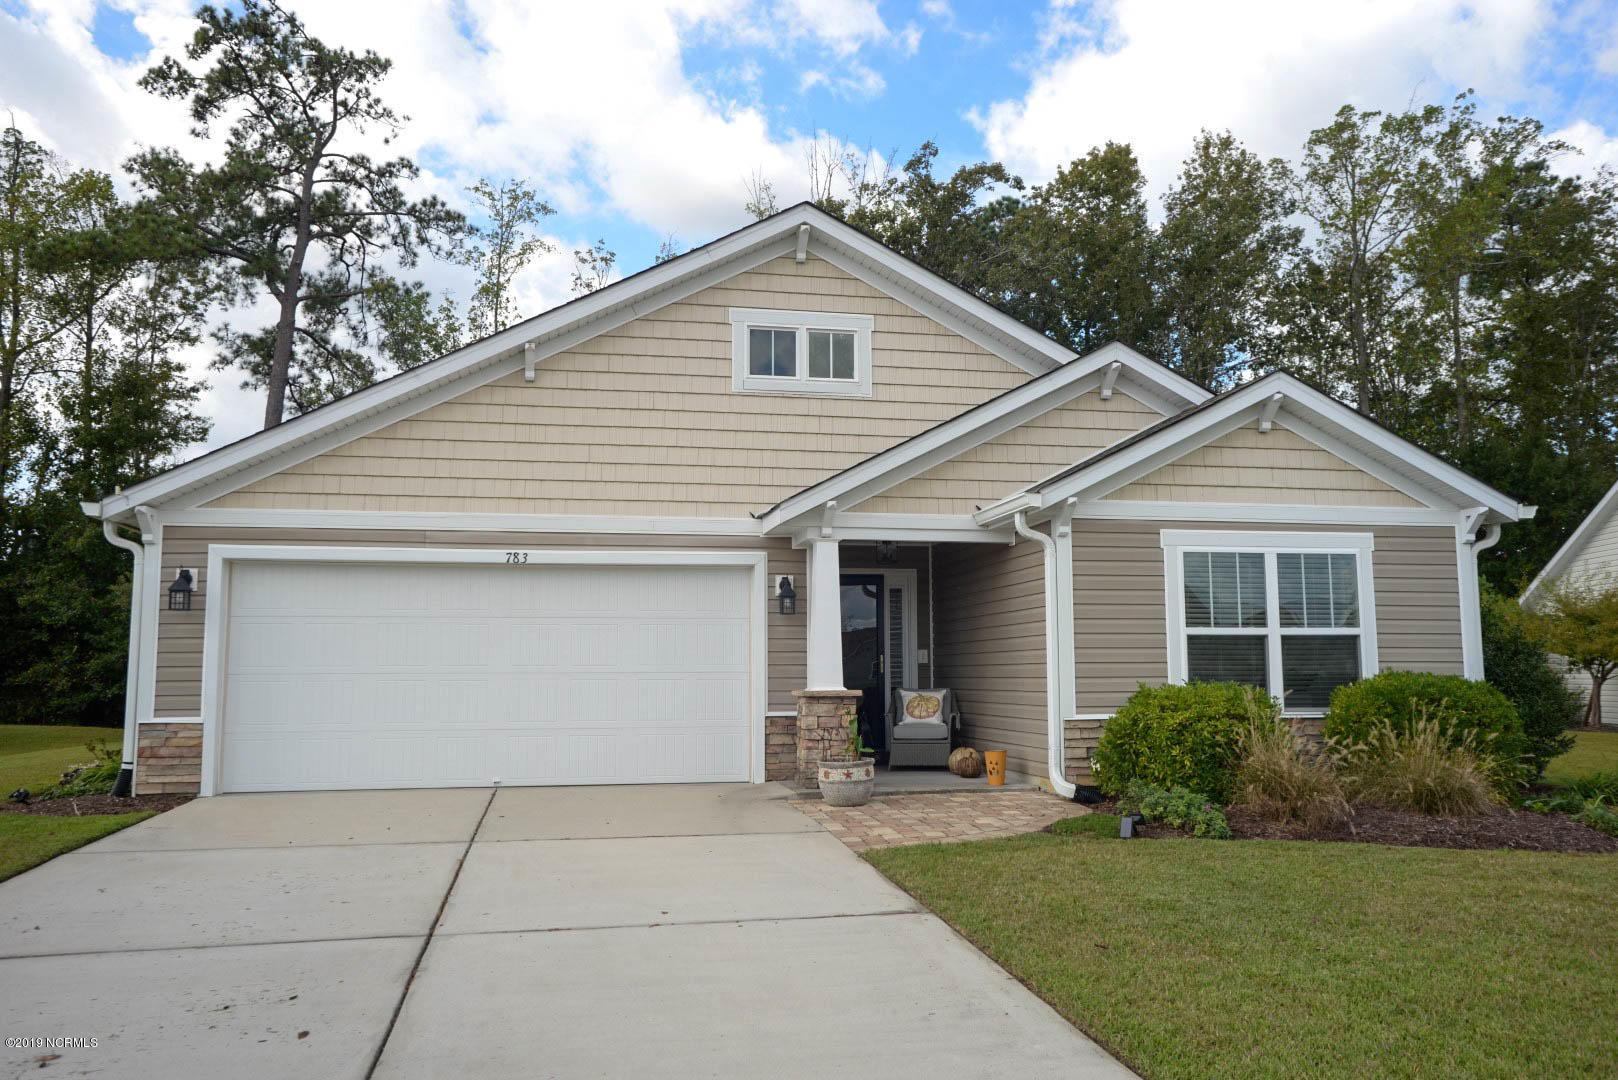 783 Heather Glen Lane Calabash, NC 28467